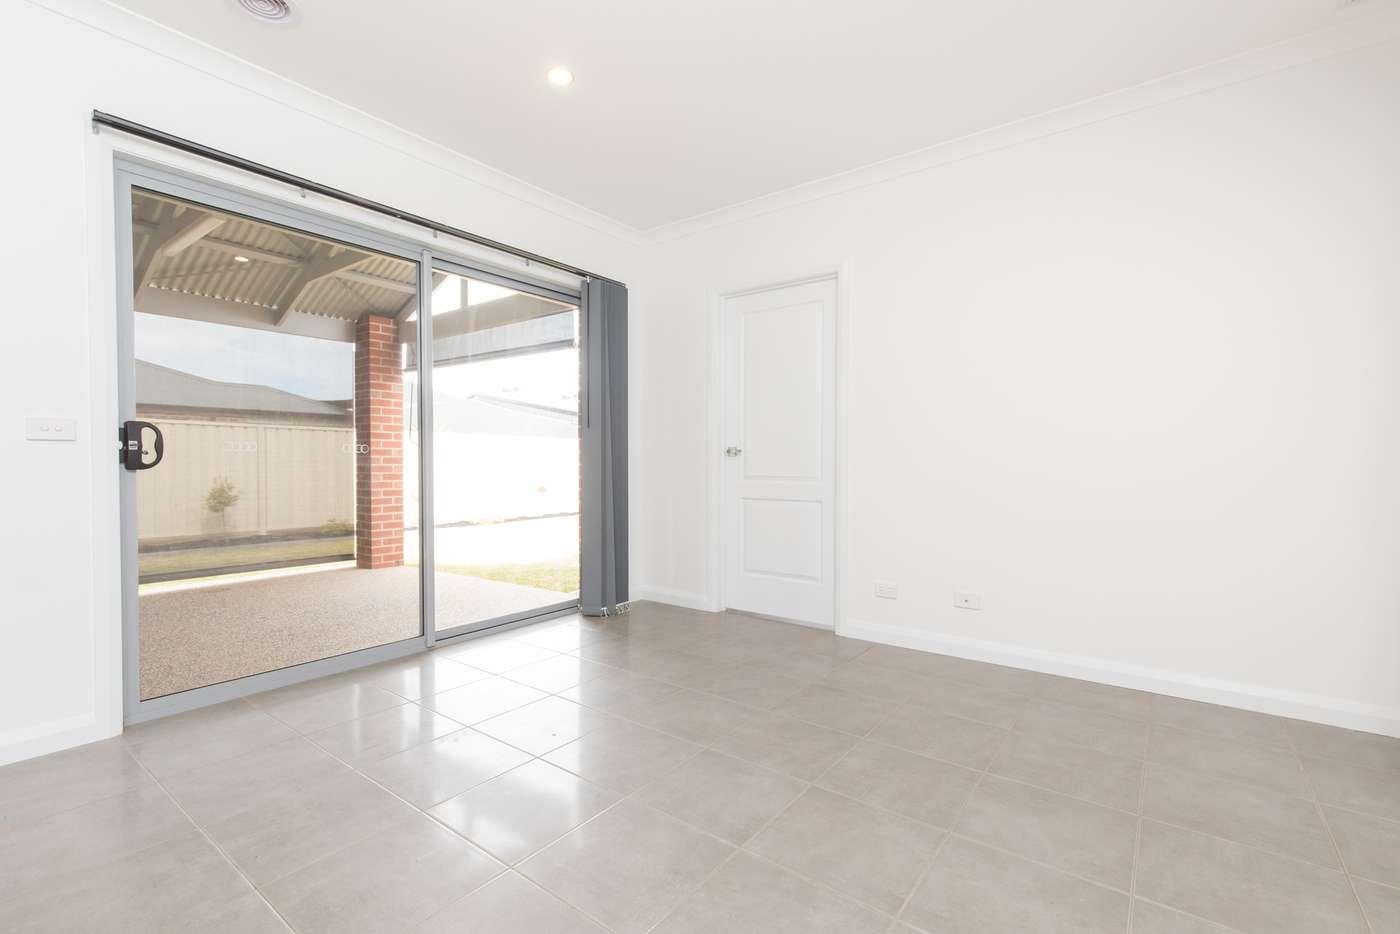 Fifth view of Homely house listing, 2 Karalanza Drive, Mildura VIC 3500